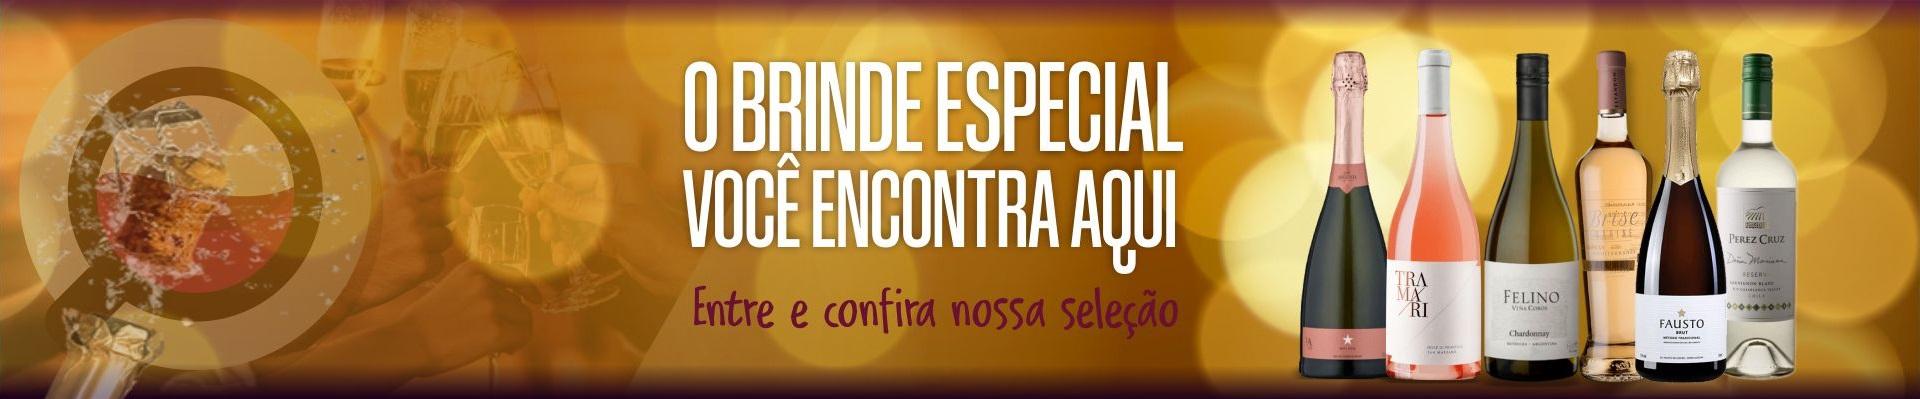 BrindeEspecial